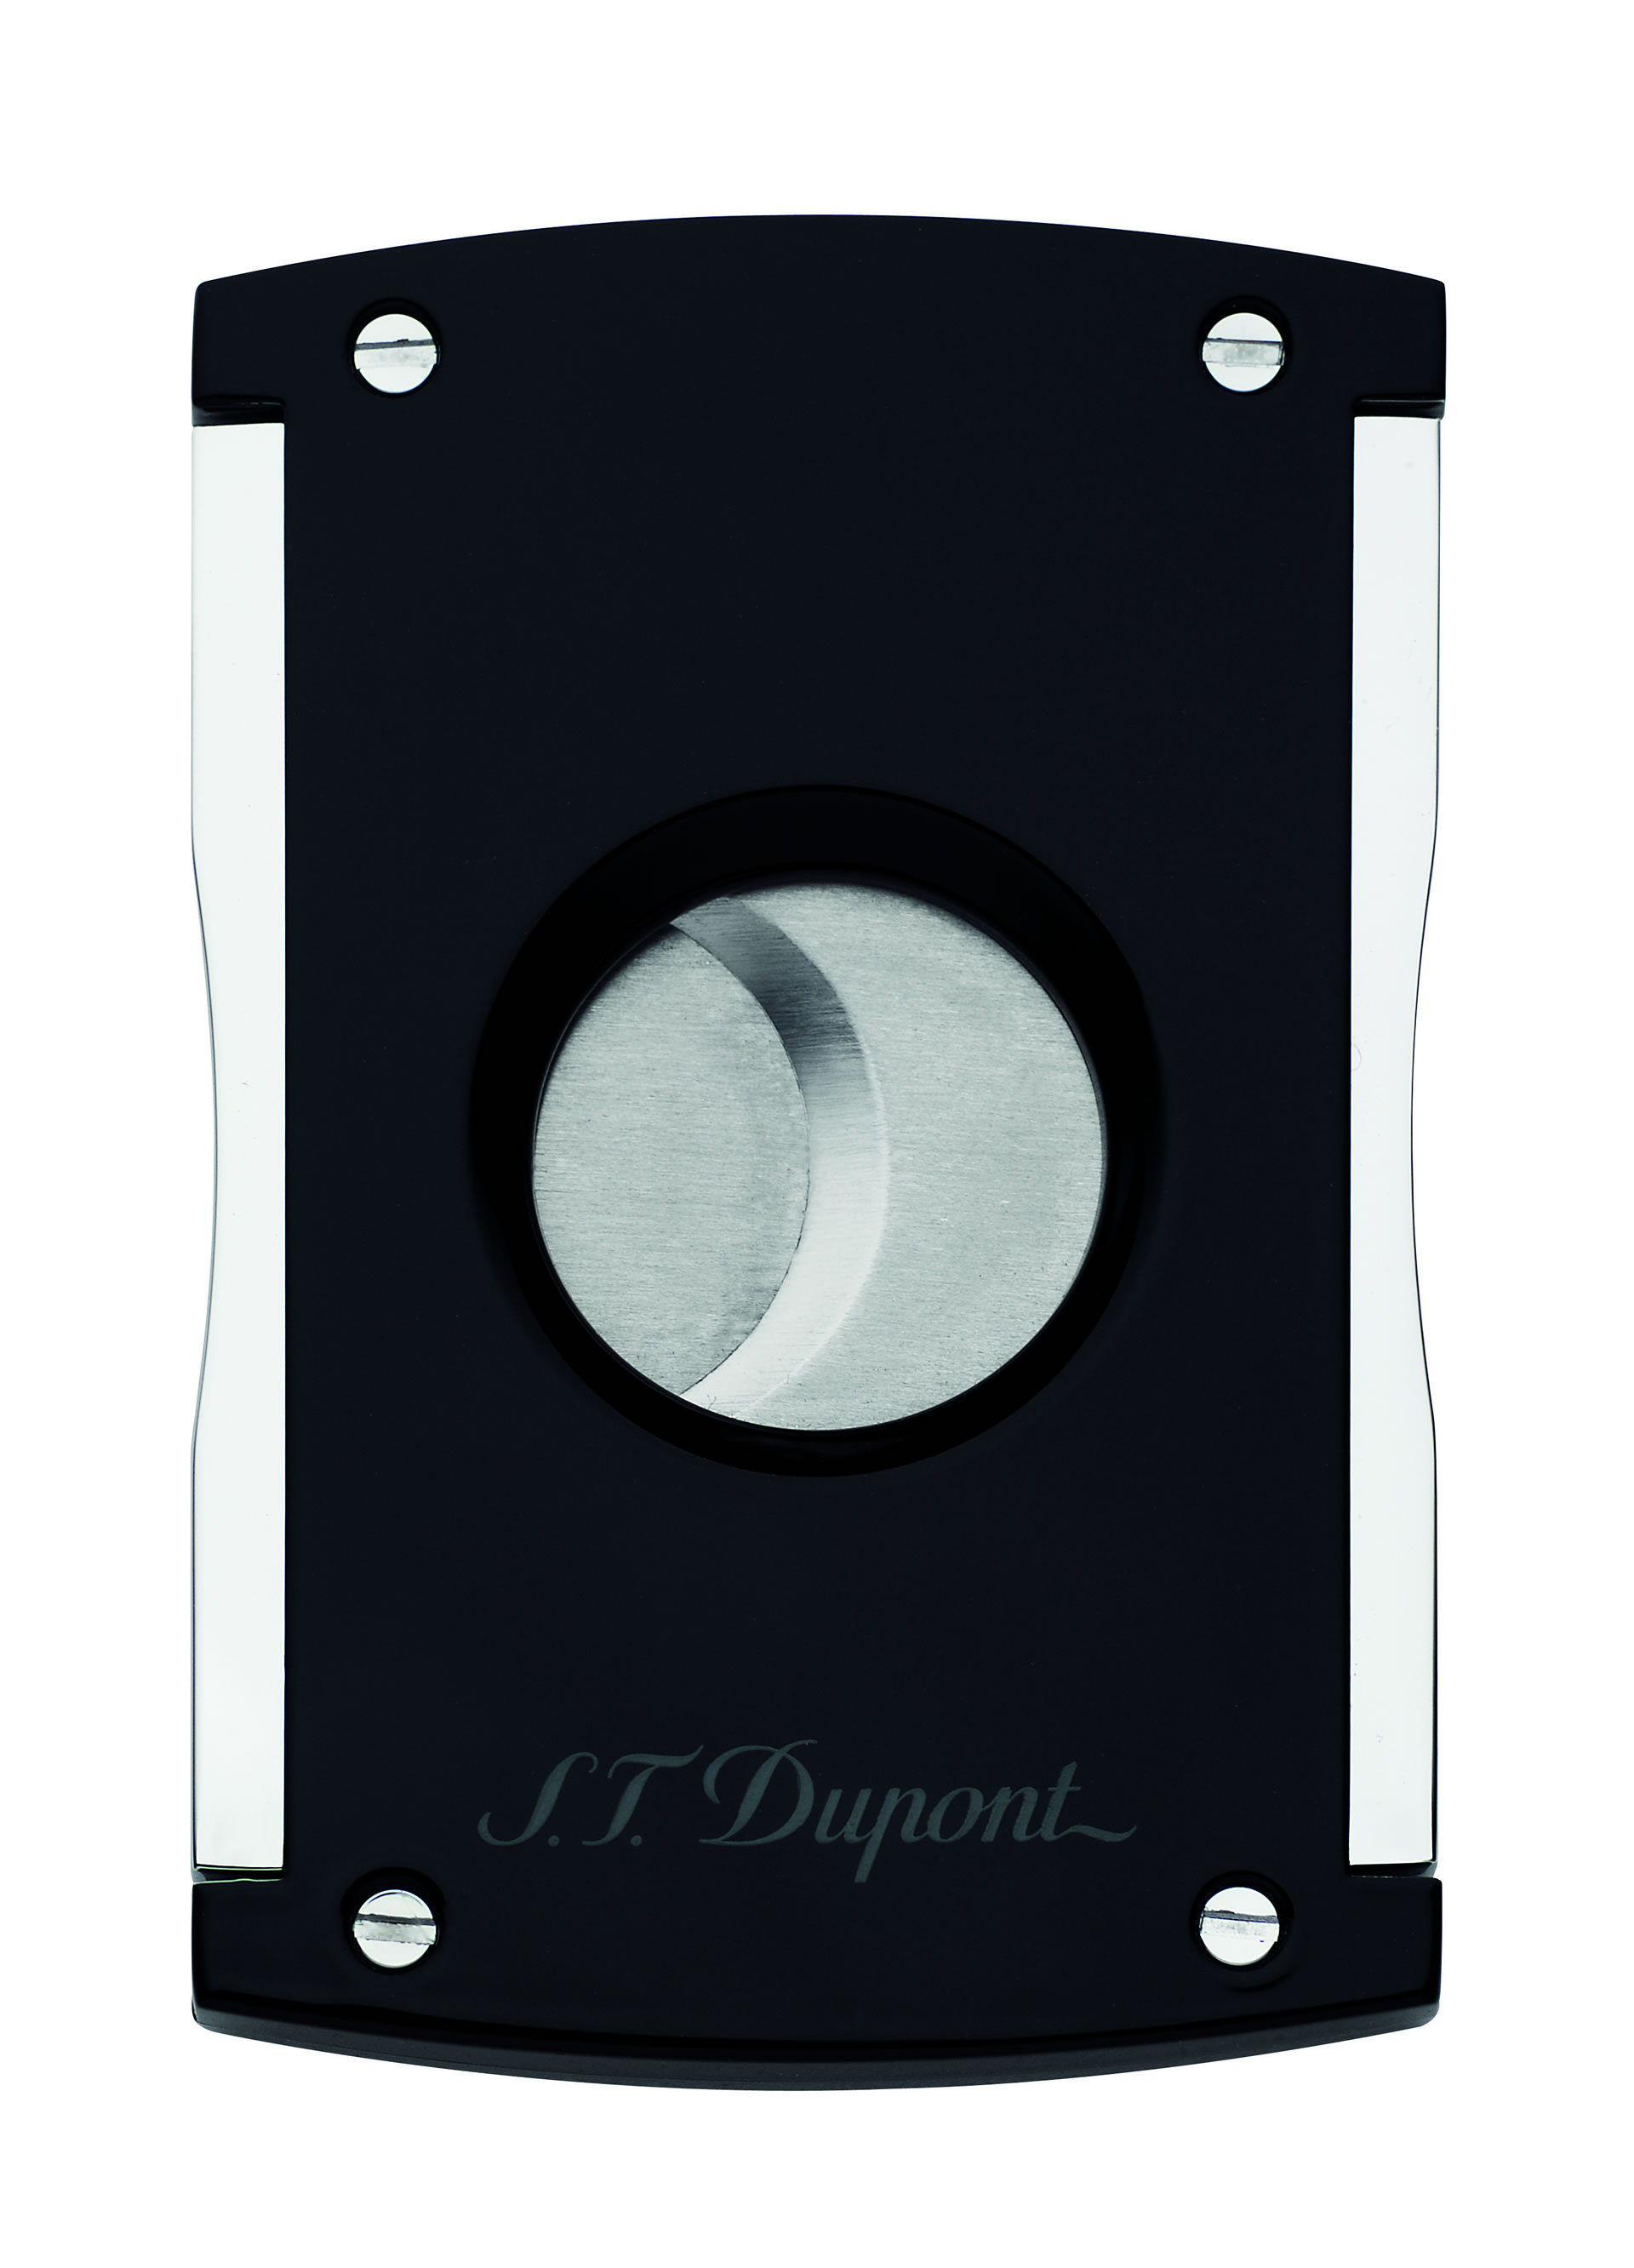 ST Dupont Maxijet Cigar Cutter